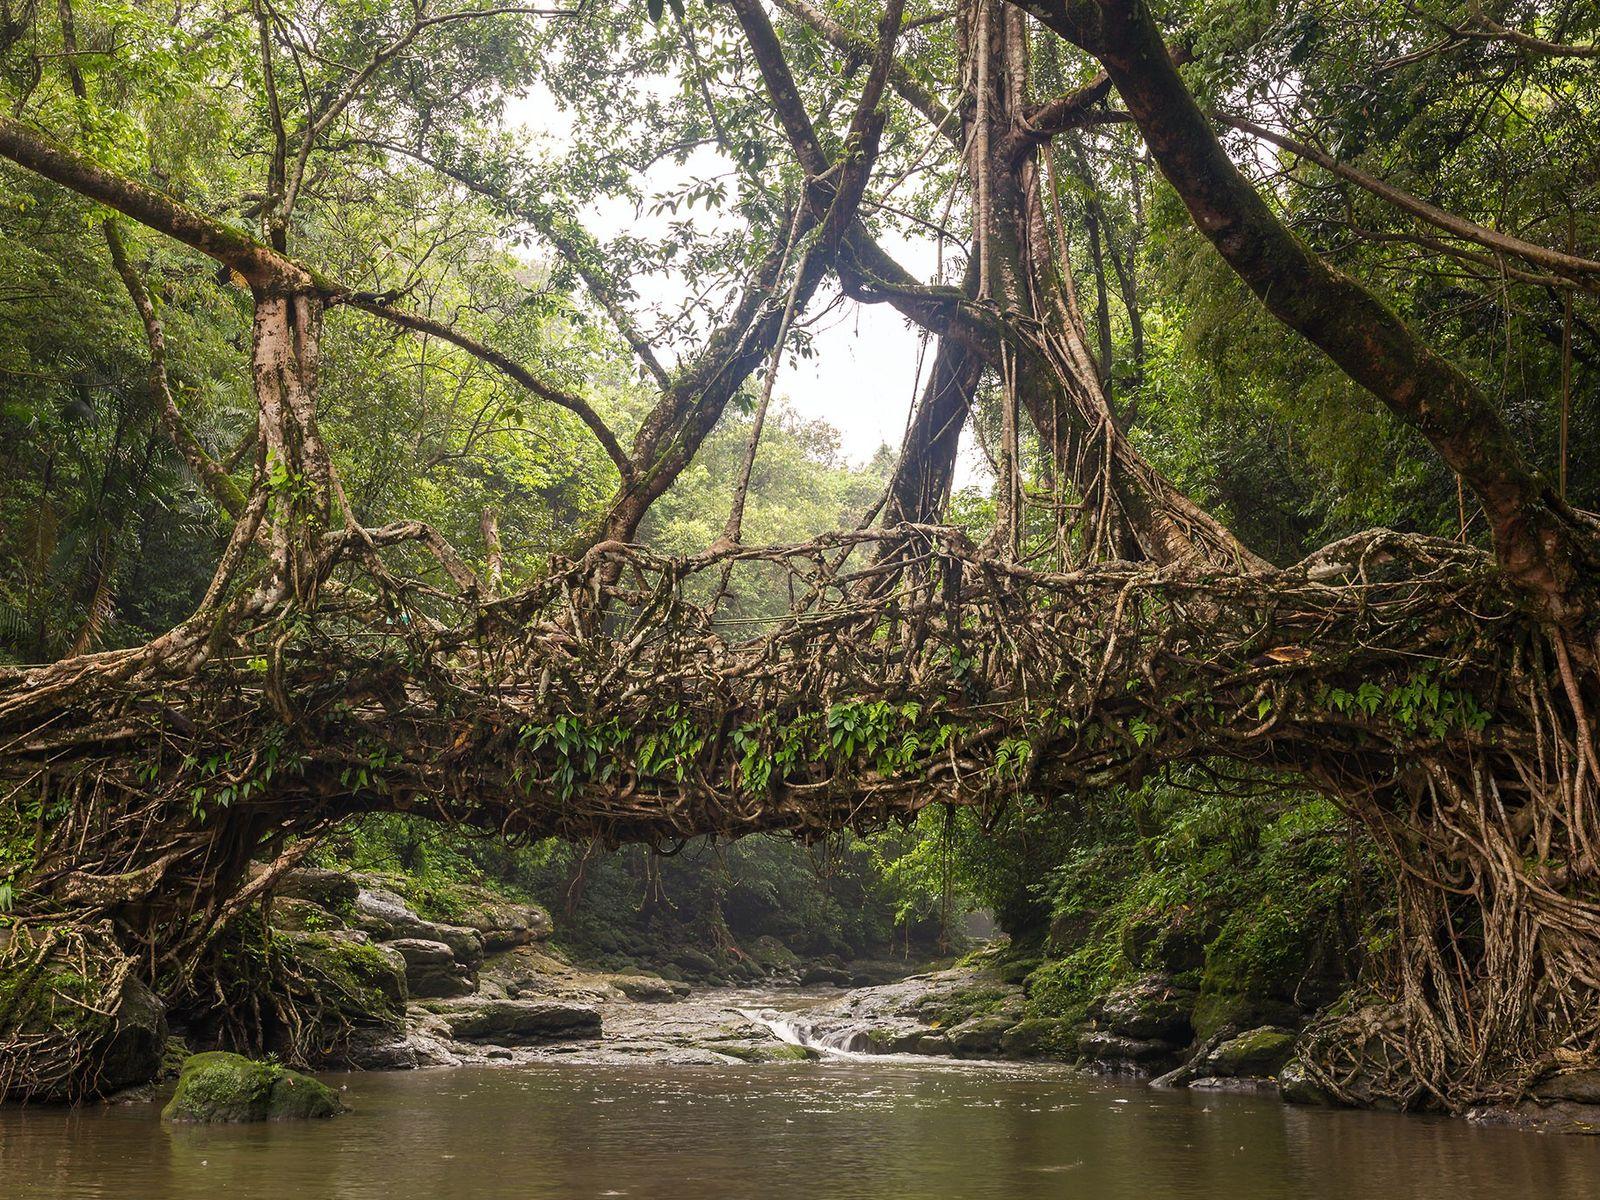 Esta ponte perto da vila de Riwai, no estado indiano de Meghalaya, foi formada a partir ...